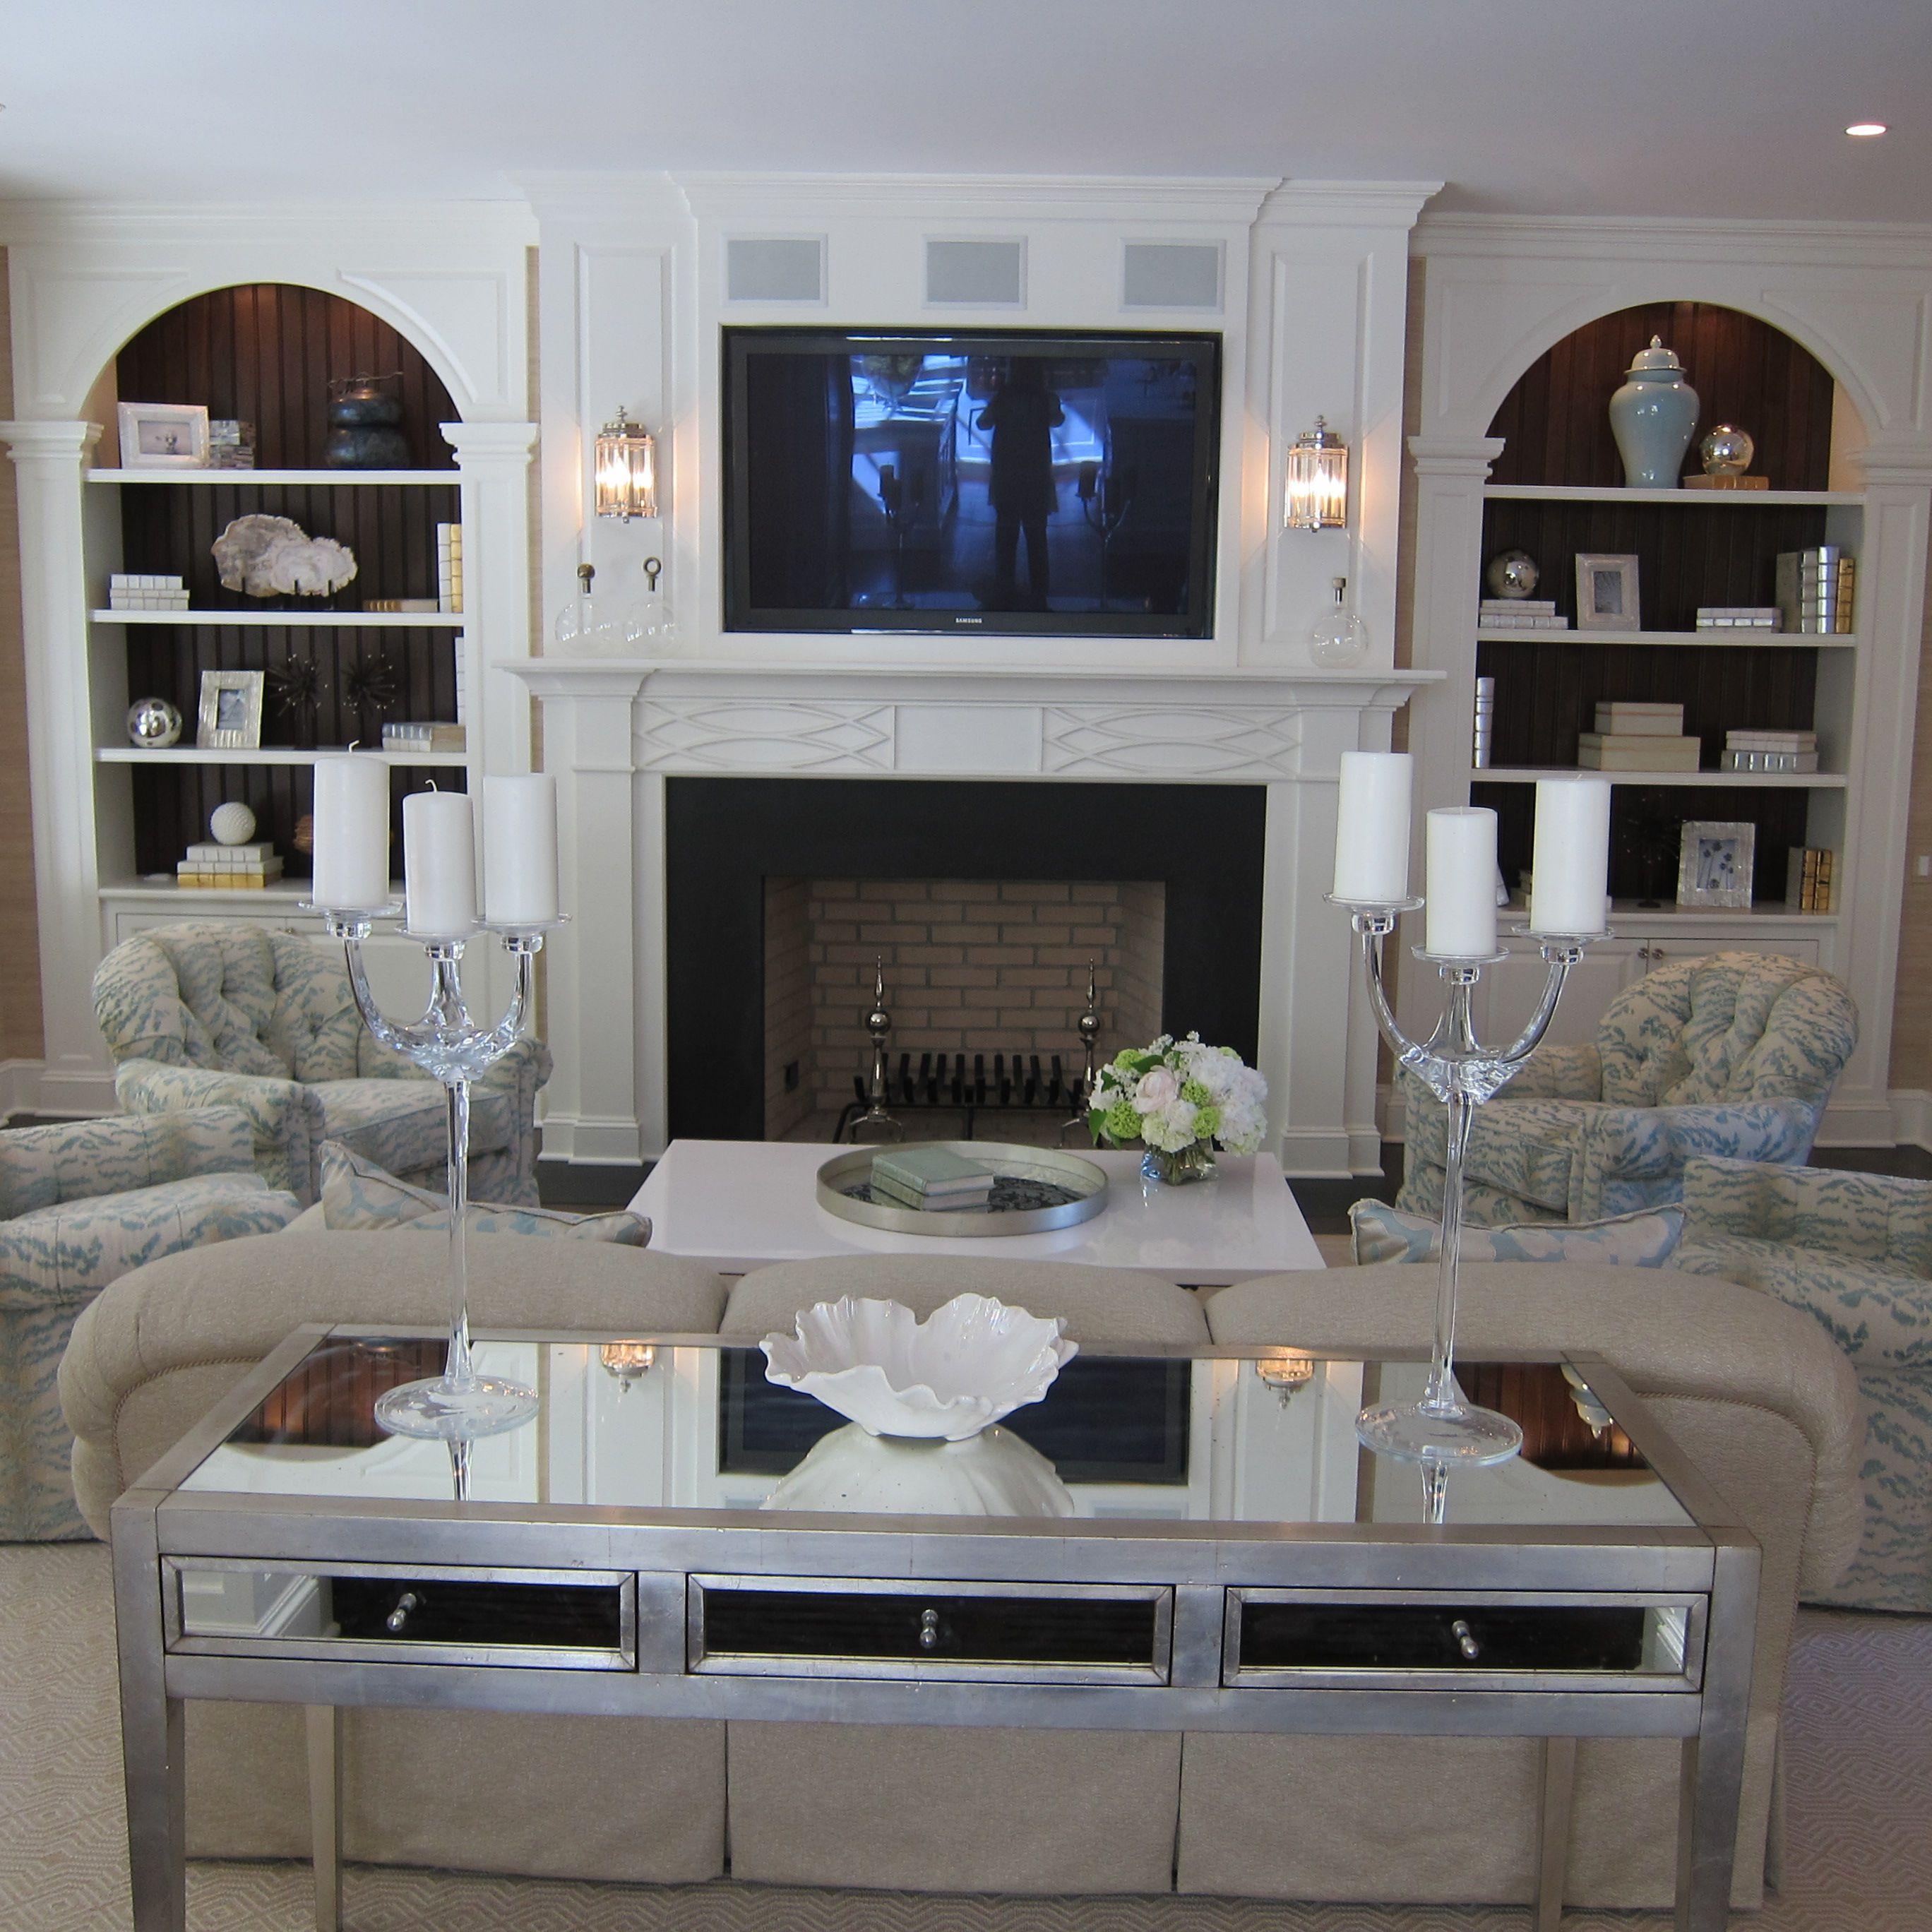 design designers fairfield portfolio kellydesigns county interior